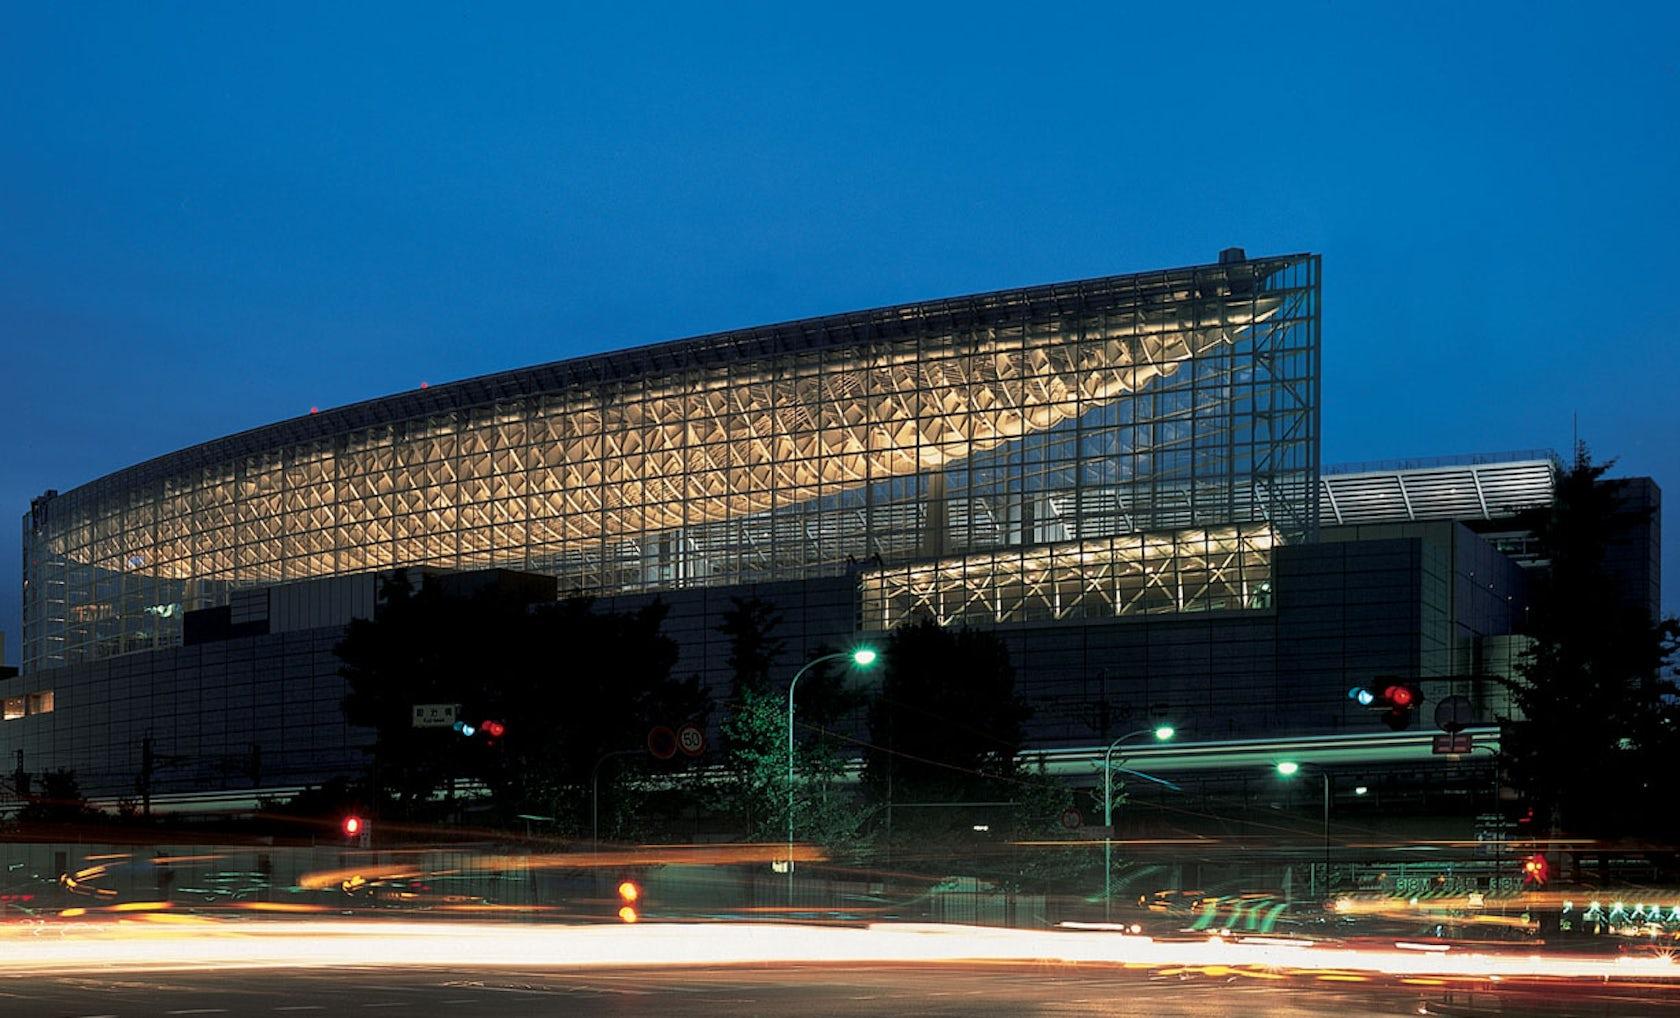 Rafael Vinoly Architects, New York - e-architect